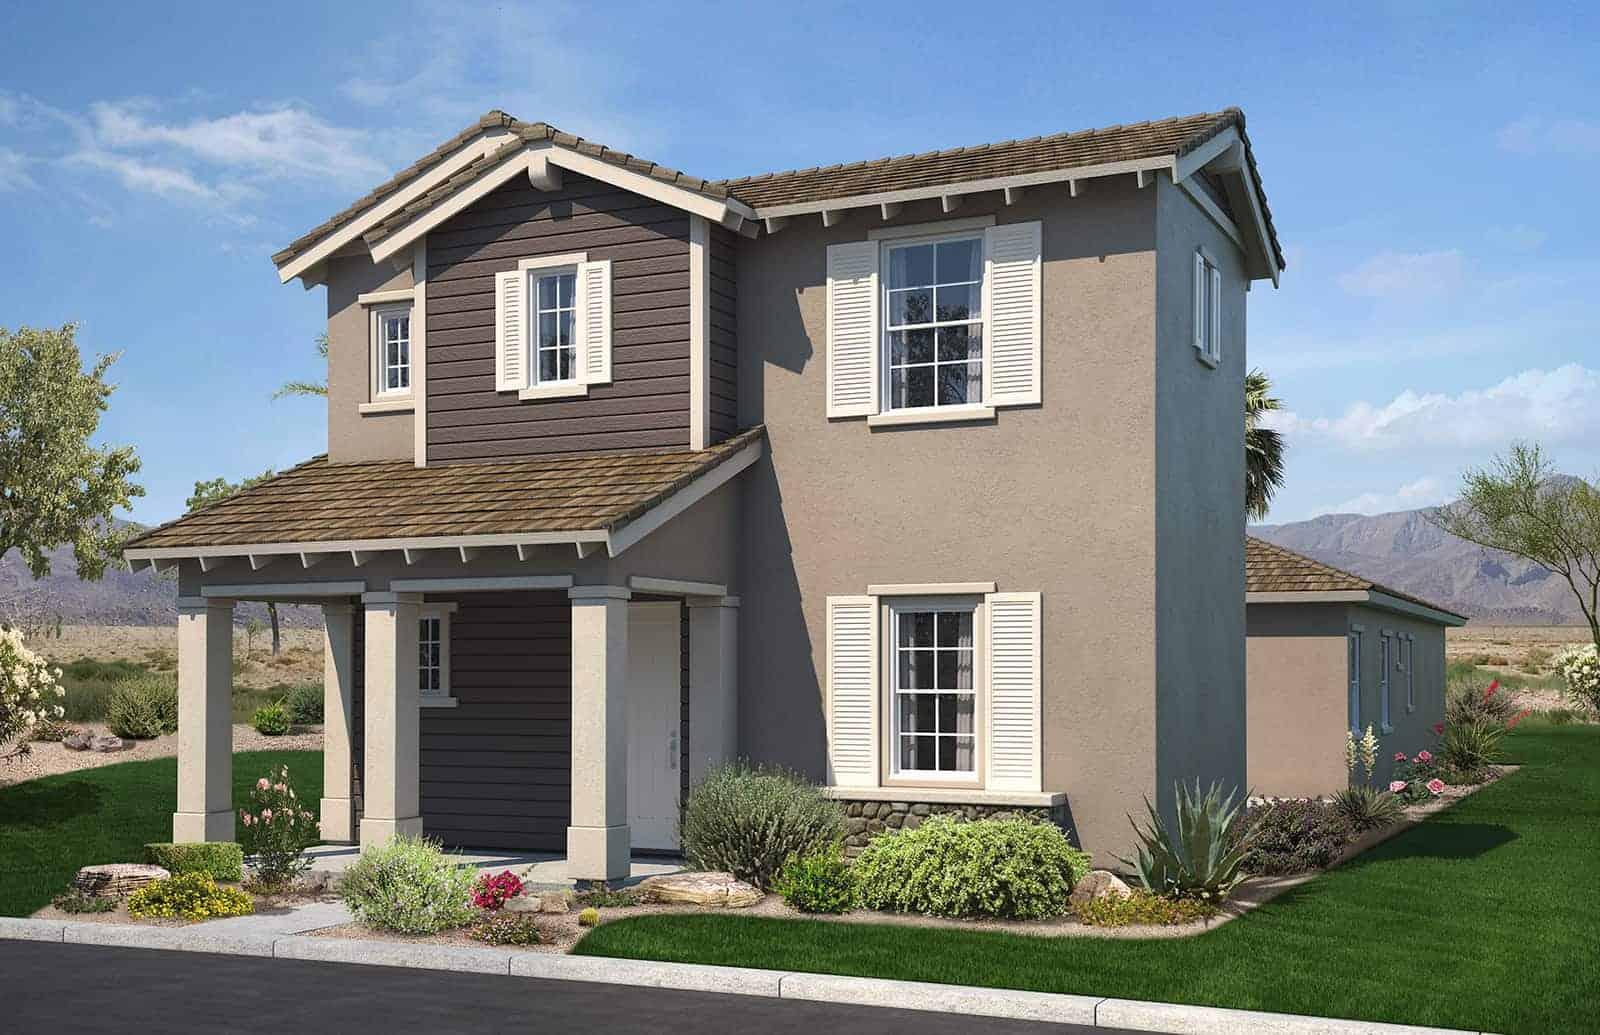 Cottages at Verrado   Residence 3   Plan B